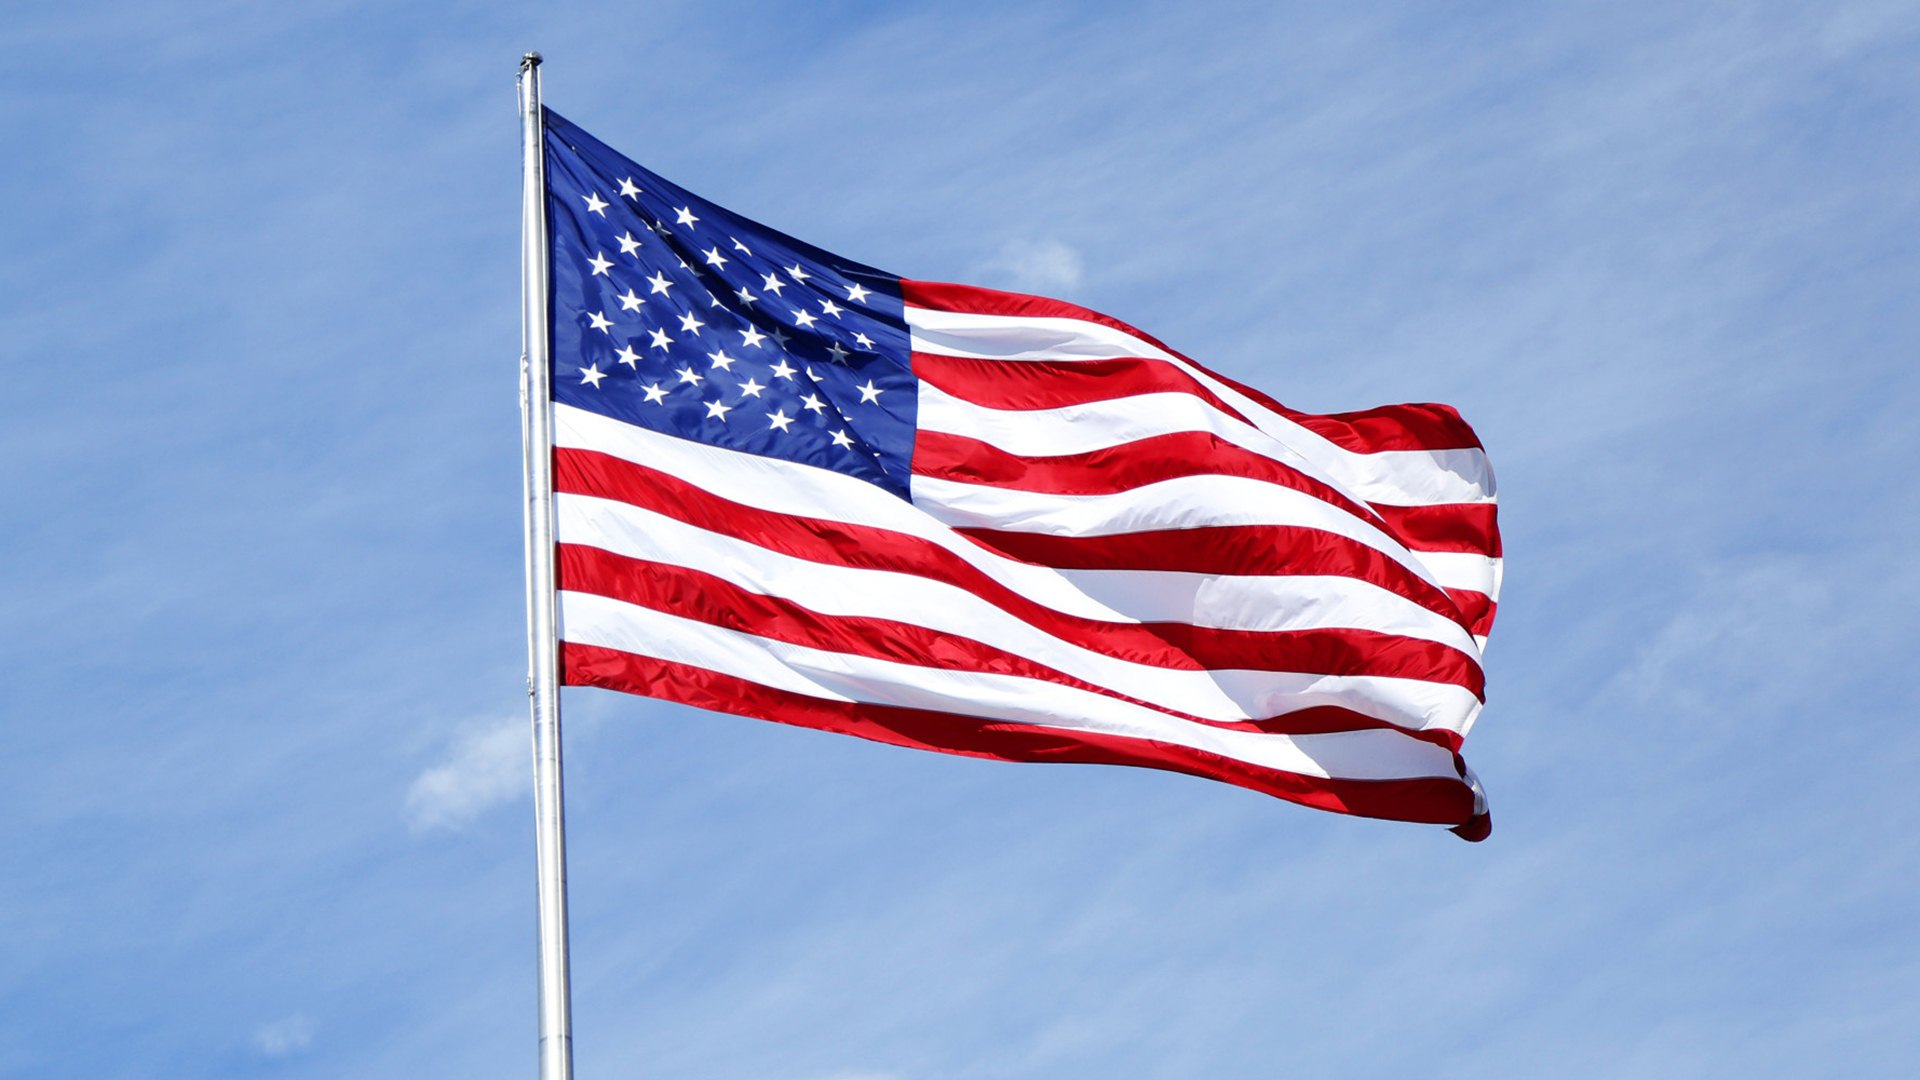 american-flag-waving-large-free